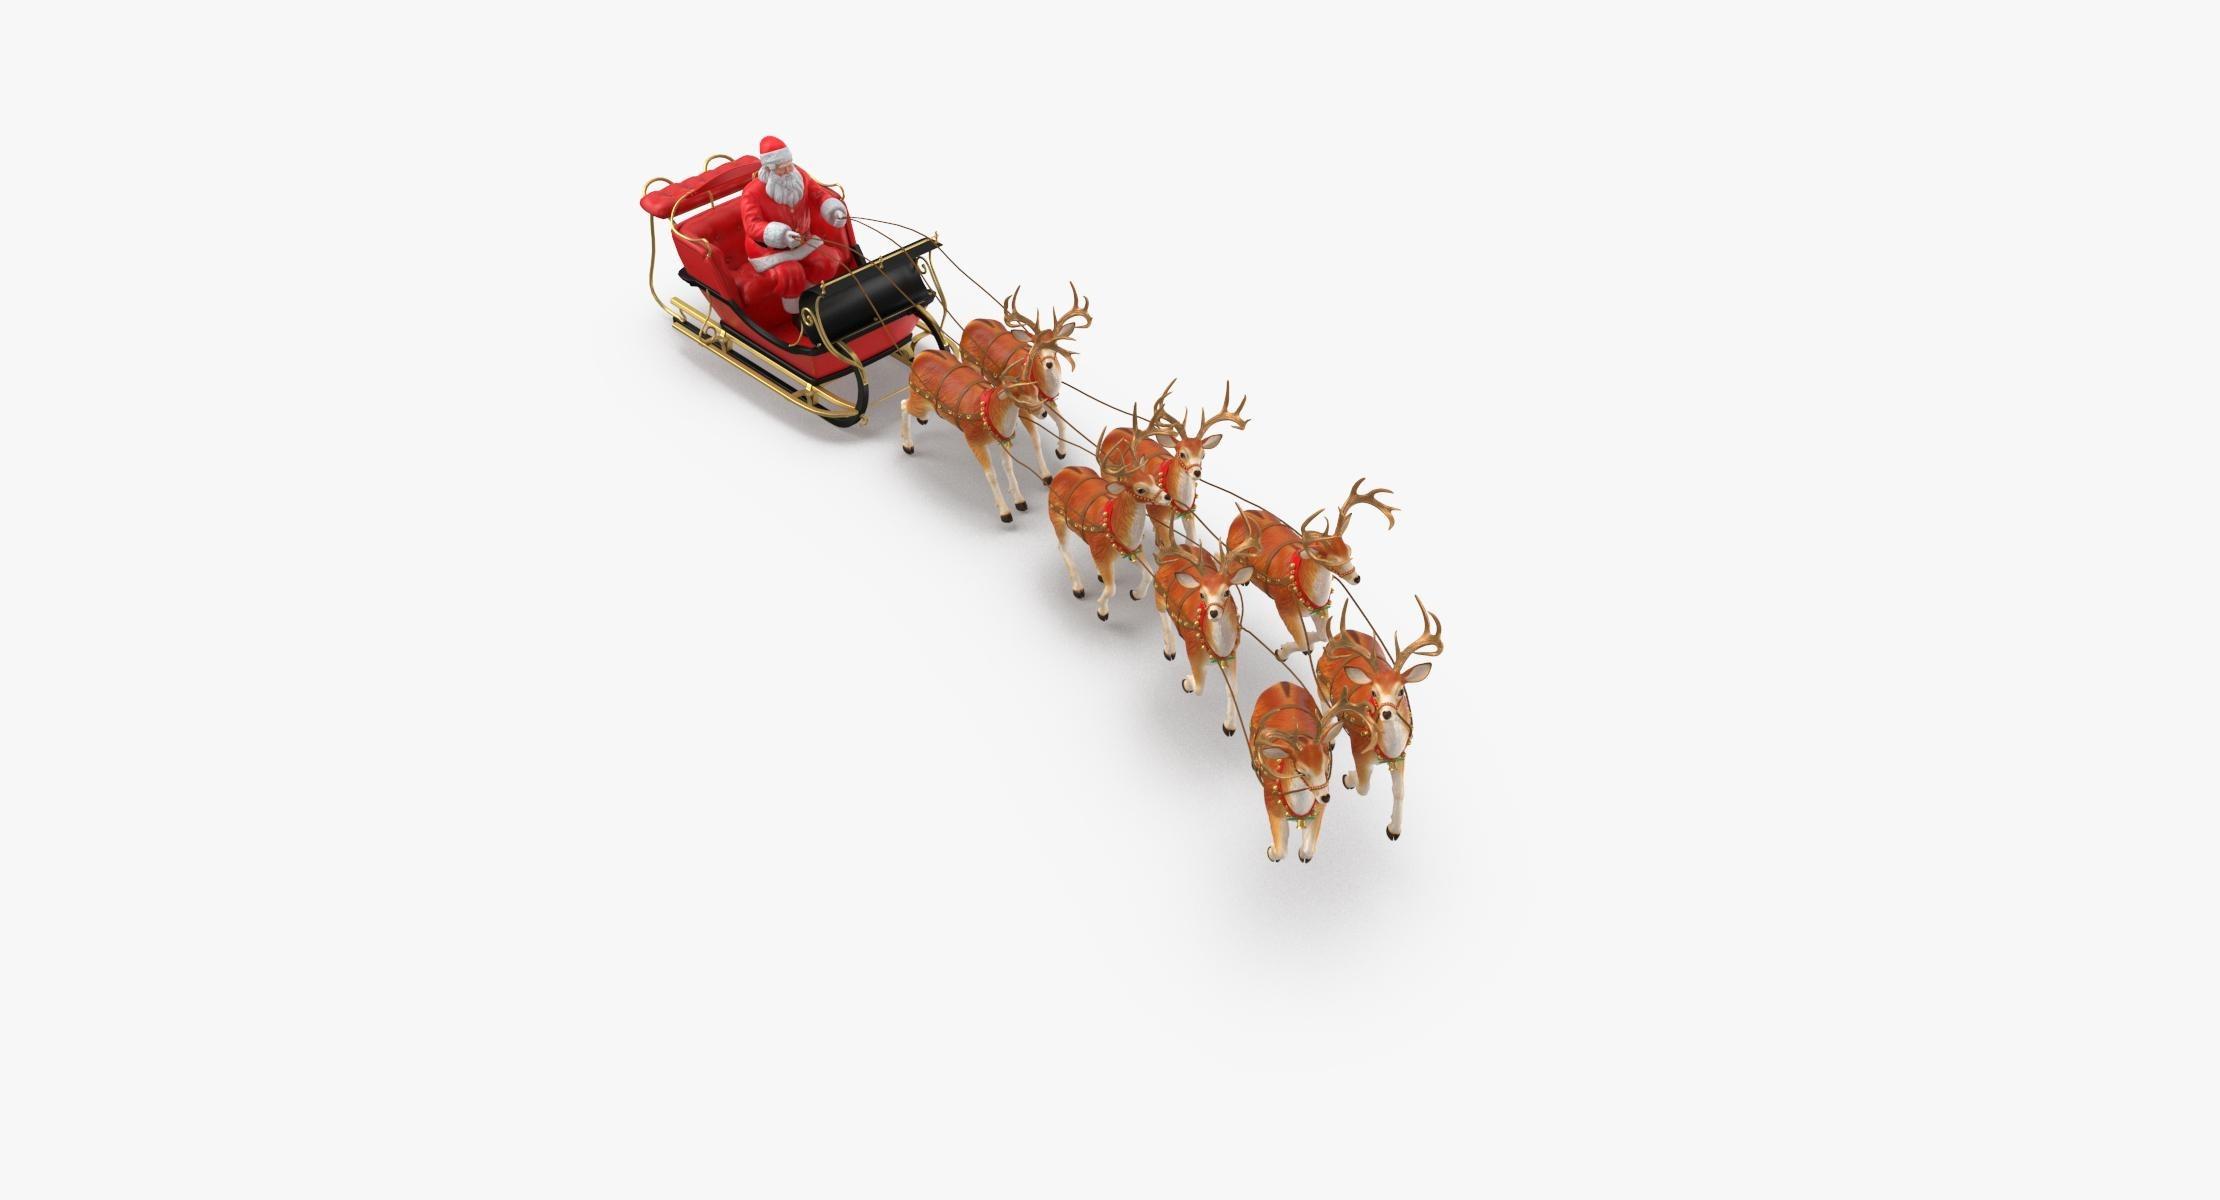 Santa Claus with Sleigh and Reindeer Flying - reel 1